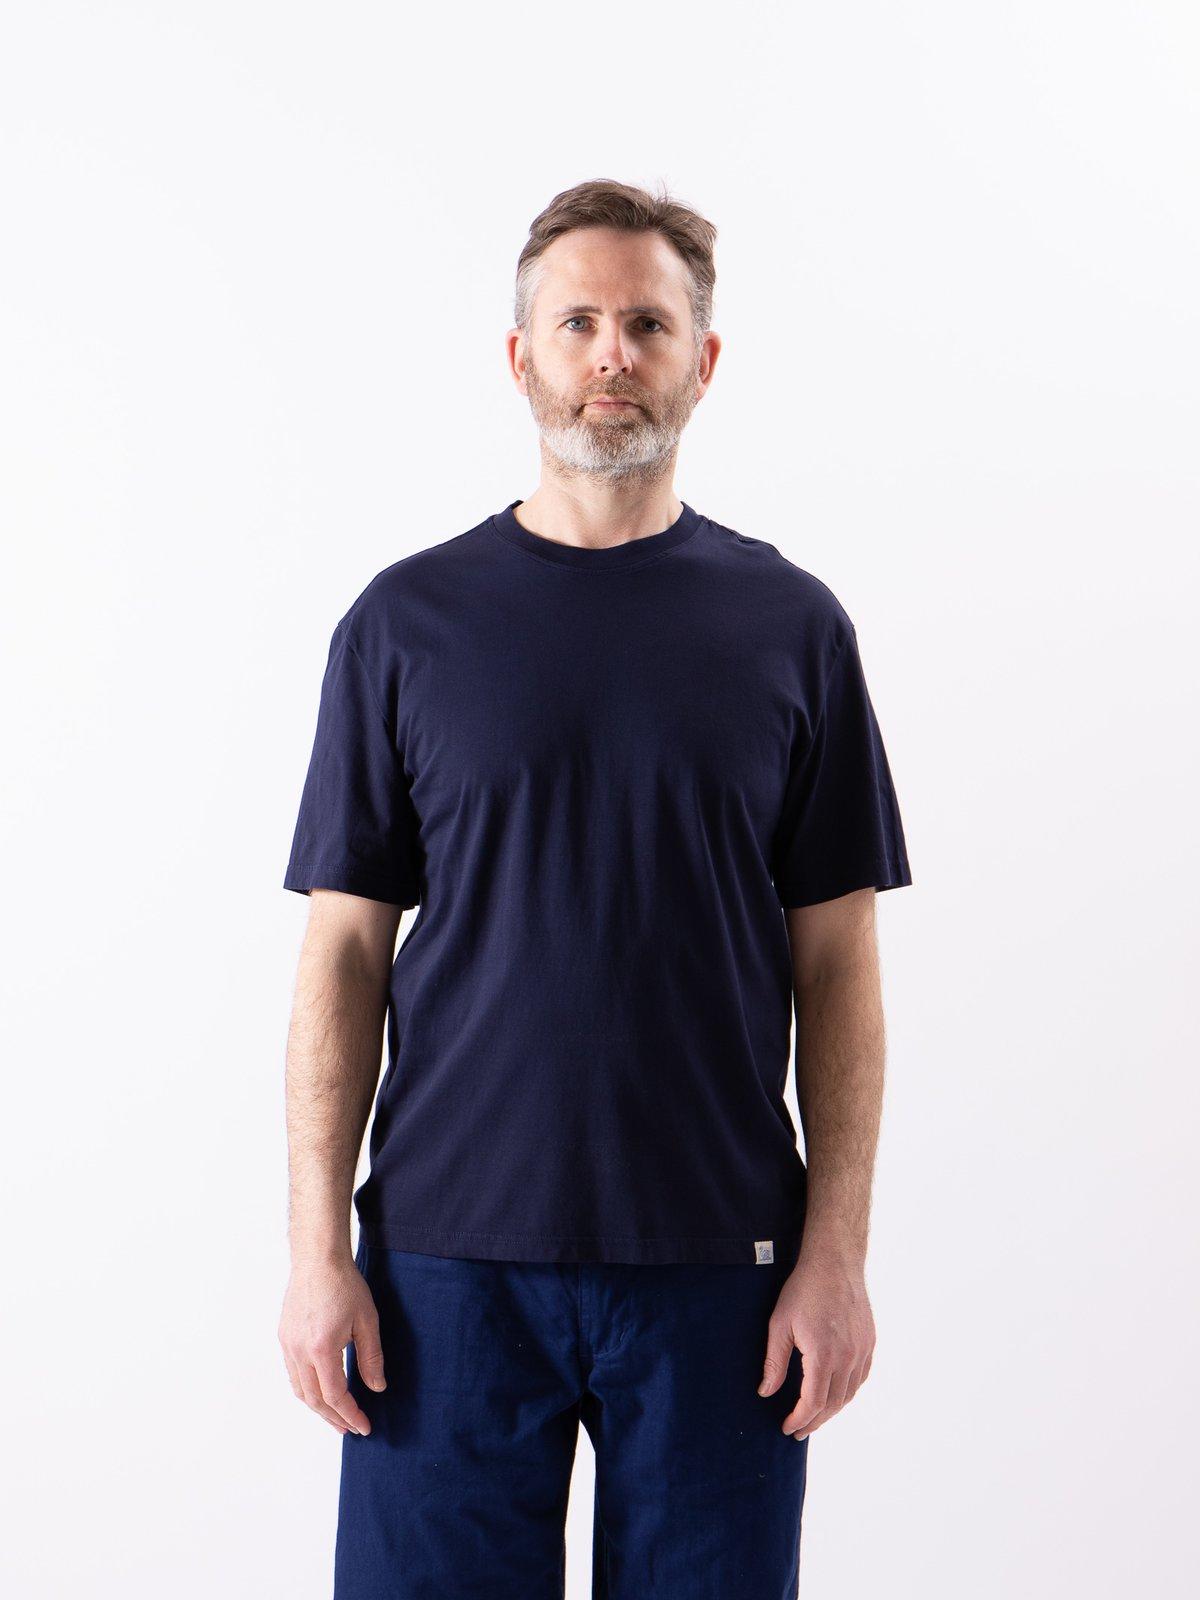 Deep Blue Good Basics CTOS01 Oversized Crew Neck Tee - Image 2